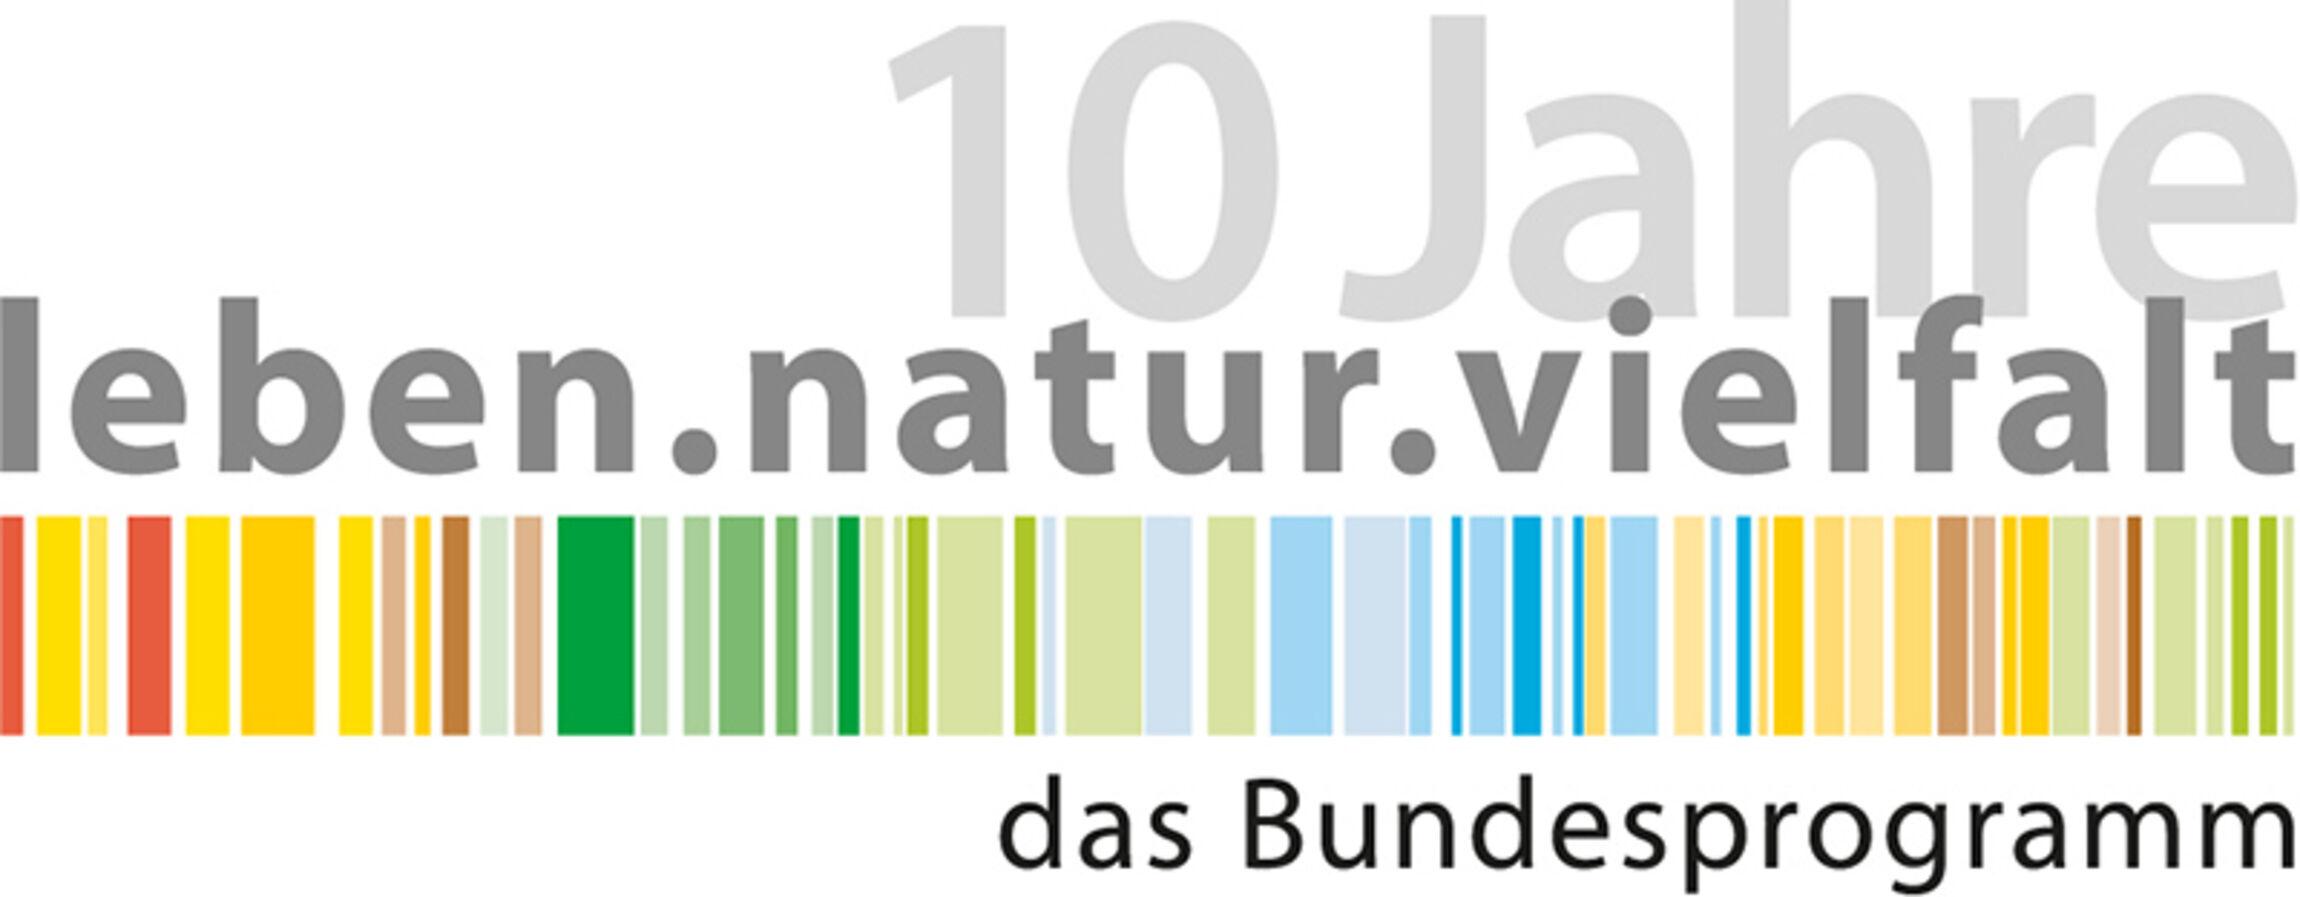 21-07-Bick-Logo-Bundesprogramm